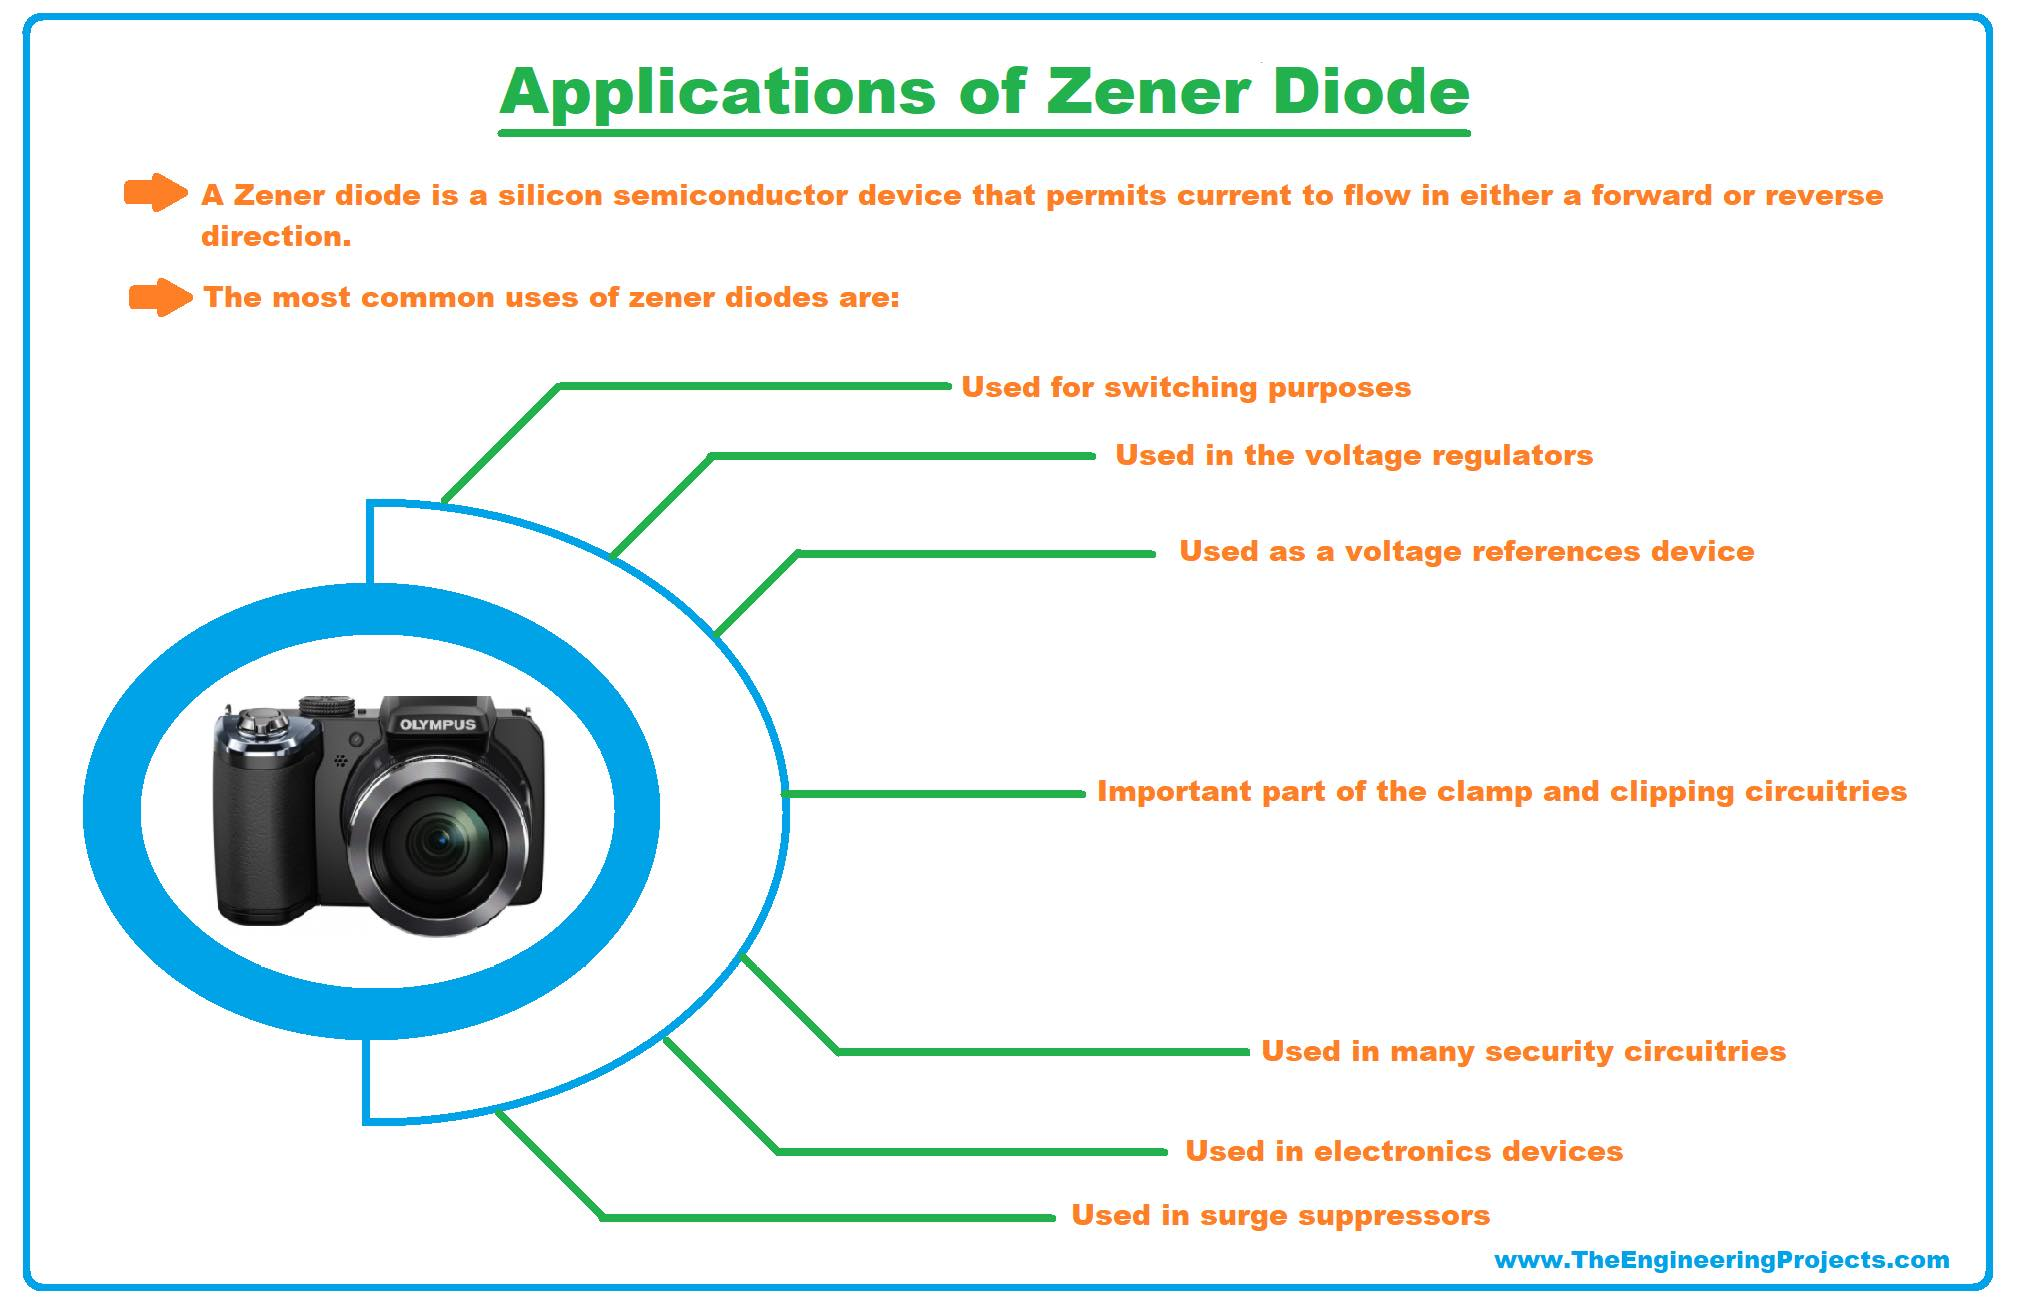 zener diode, what is zener diode, zener diode working, zener diode advantages, zener diode breakdown voltage, zener diode applications, zener diode characteristics